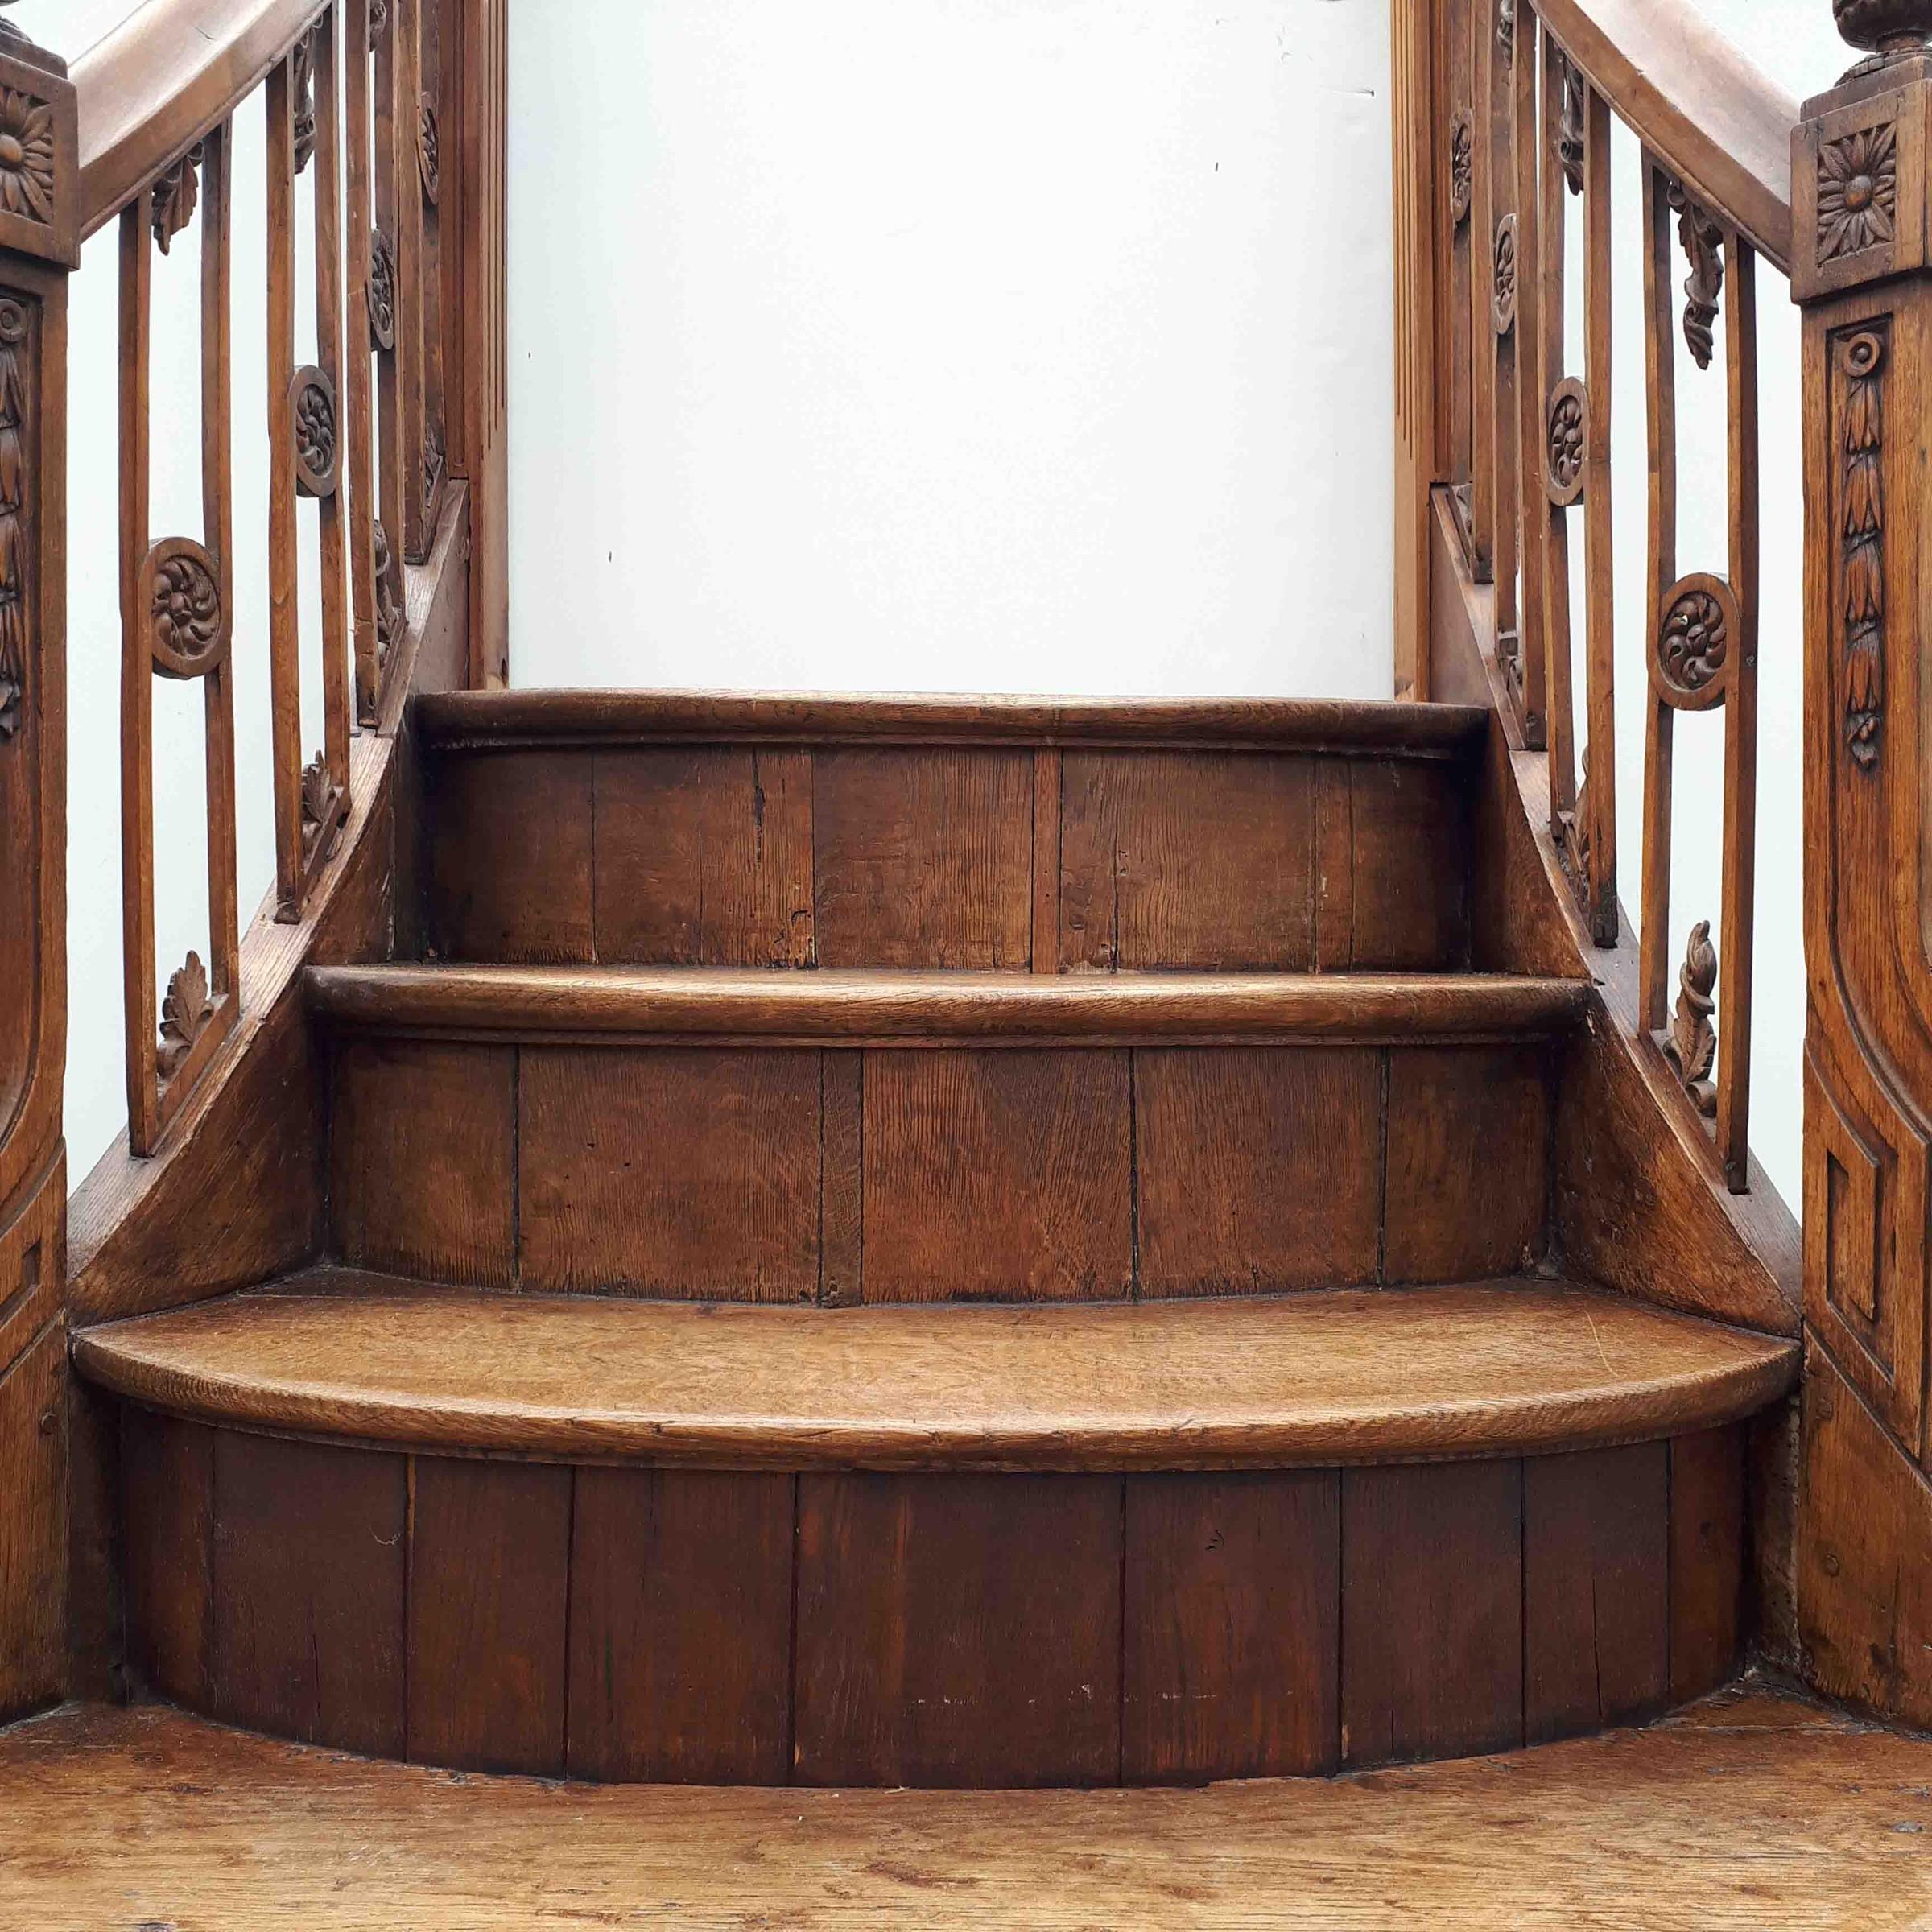 Antieke houten trap Lodewijk XVI stijl